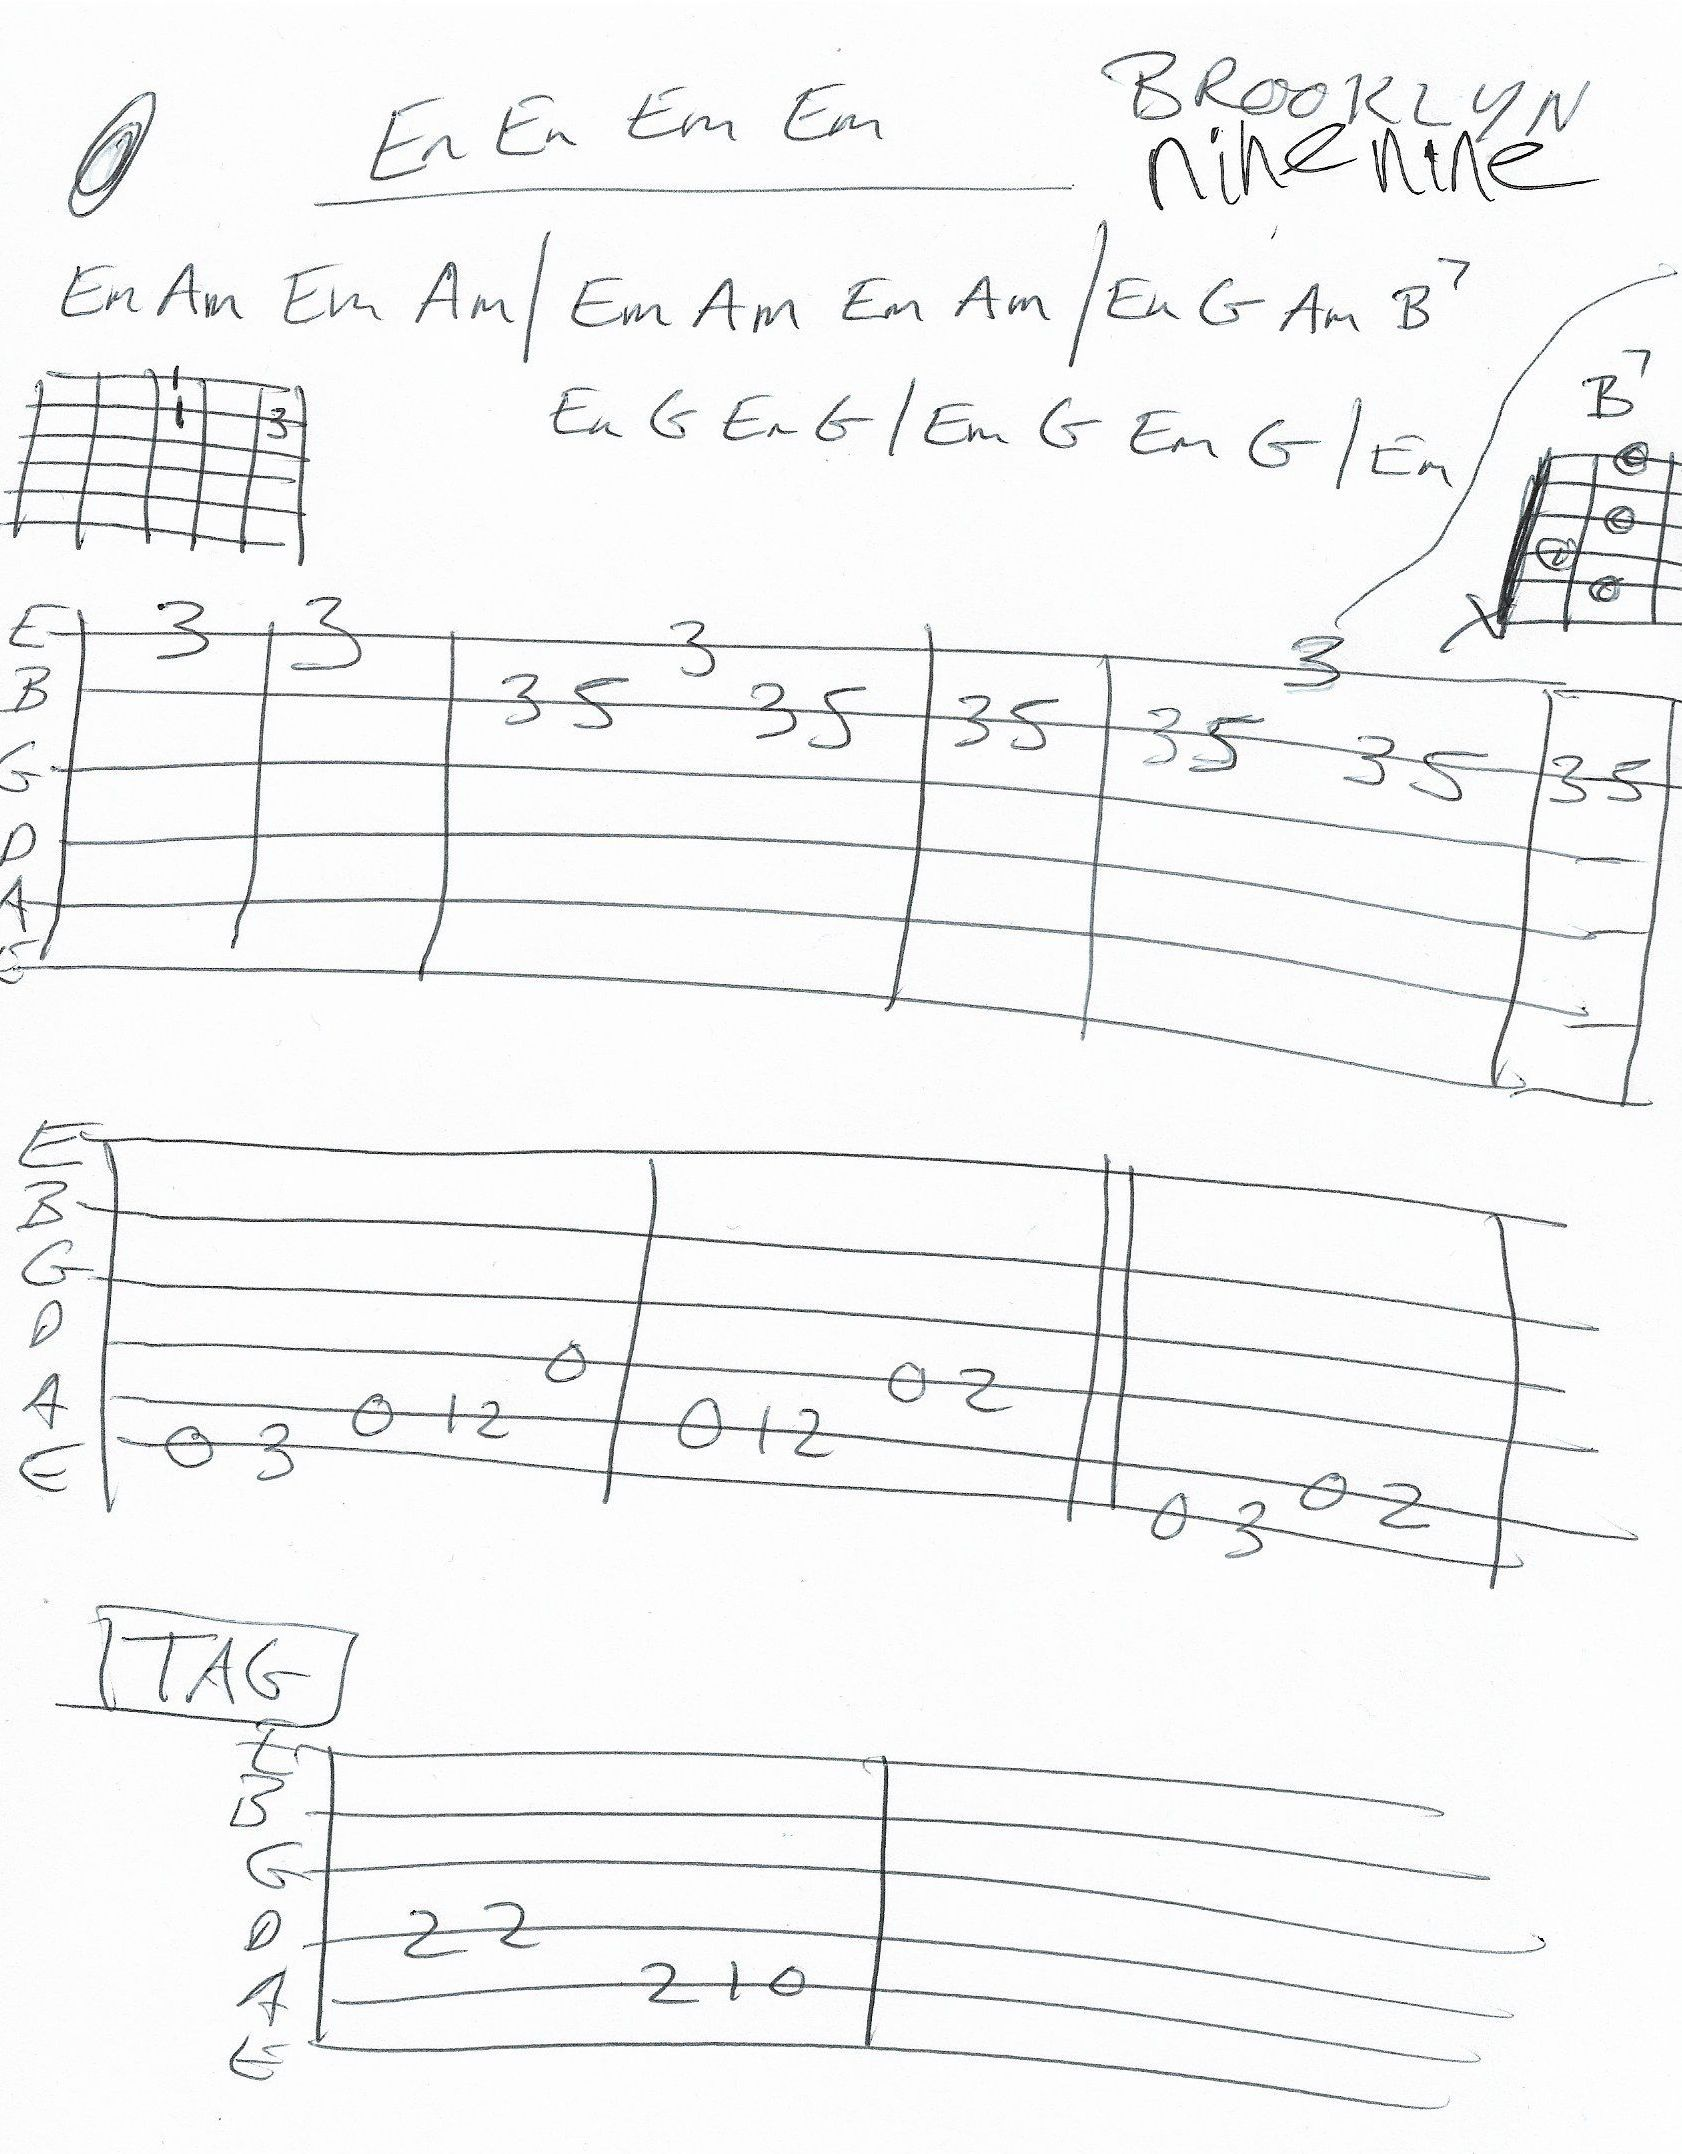 Brooklyn Nine Nine Theme Guitar Chord Chart 2018 Guitar Lesson